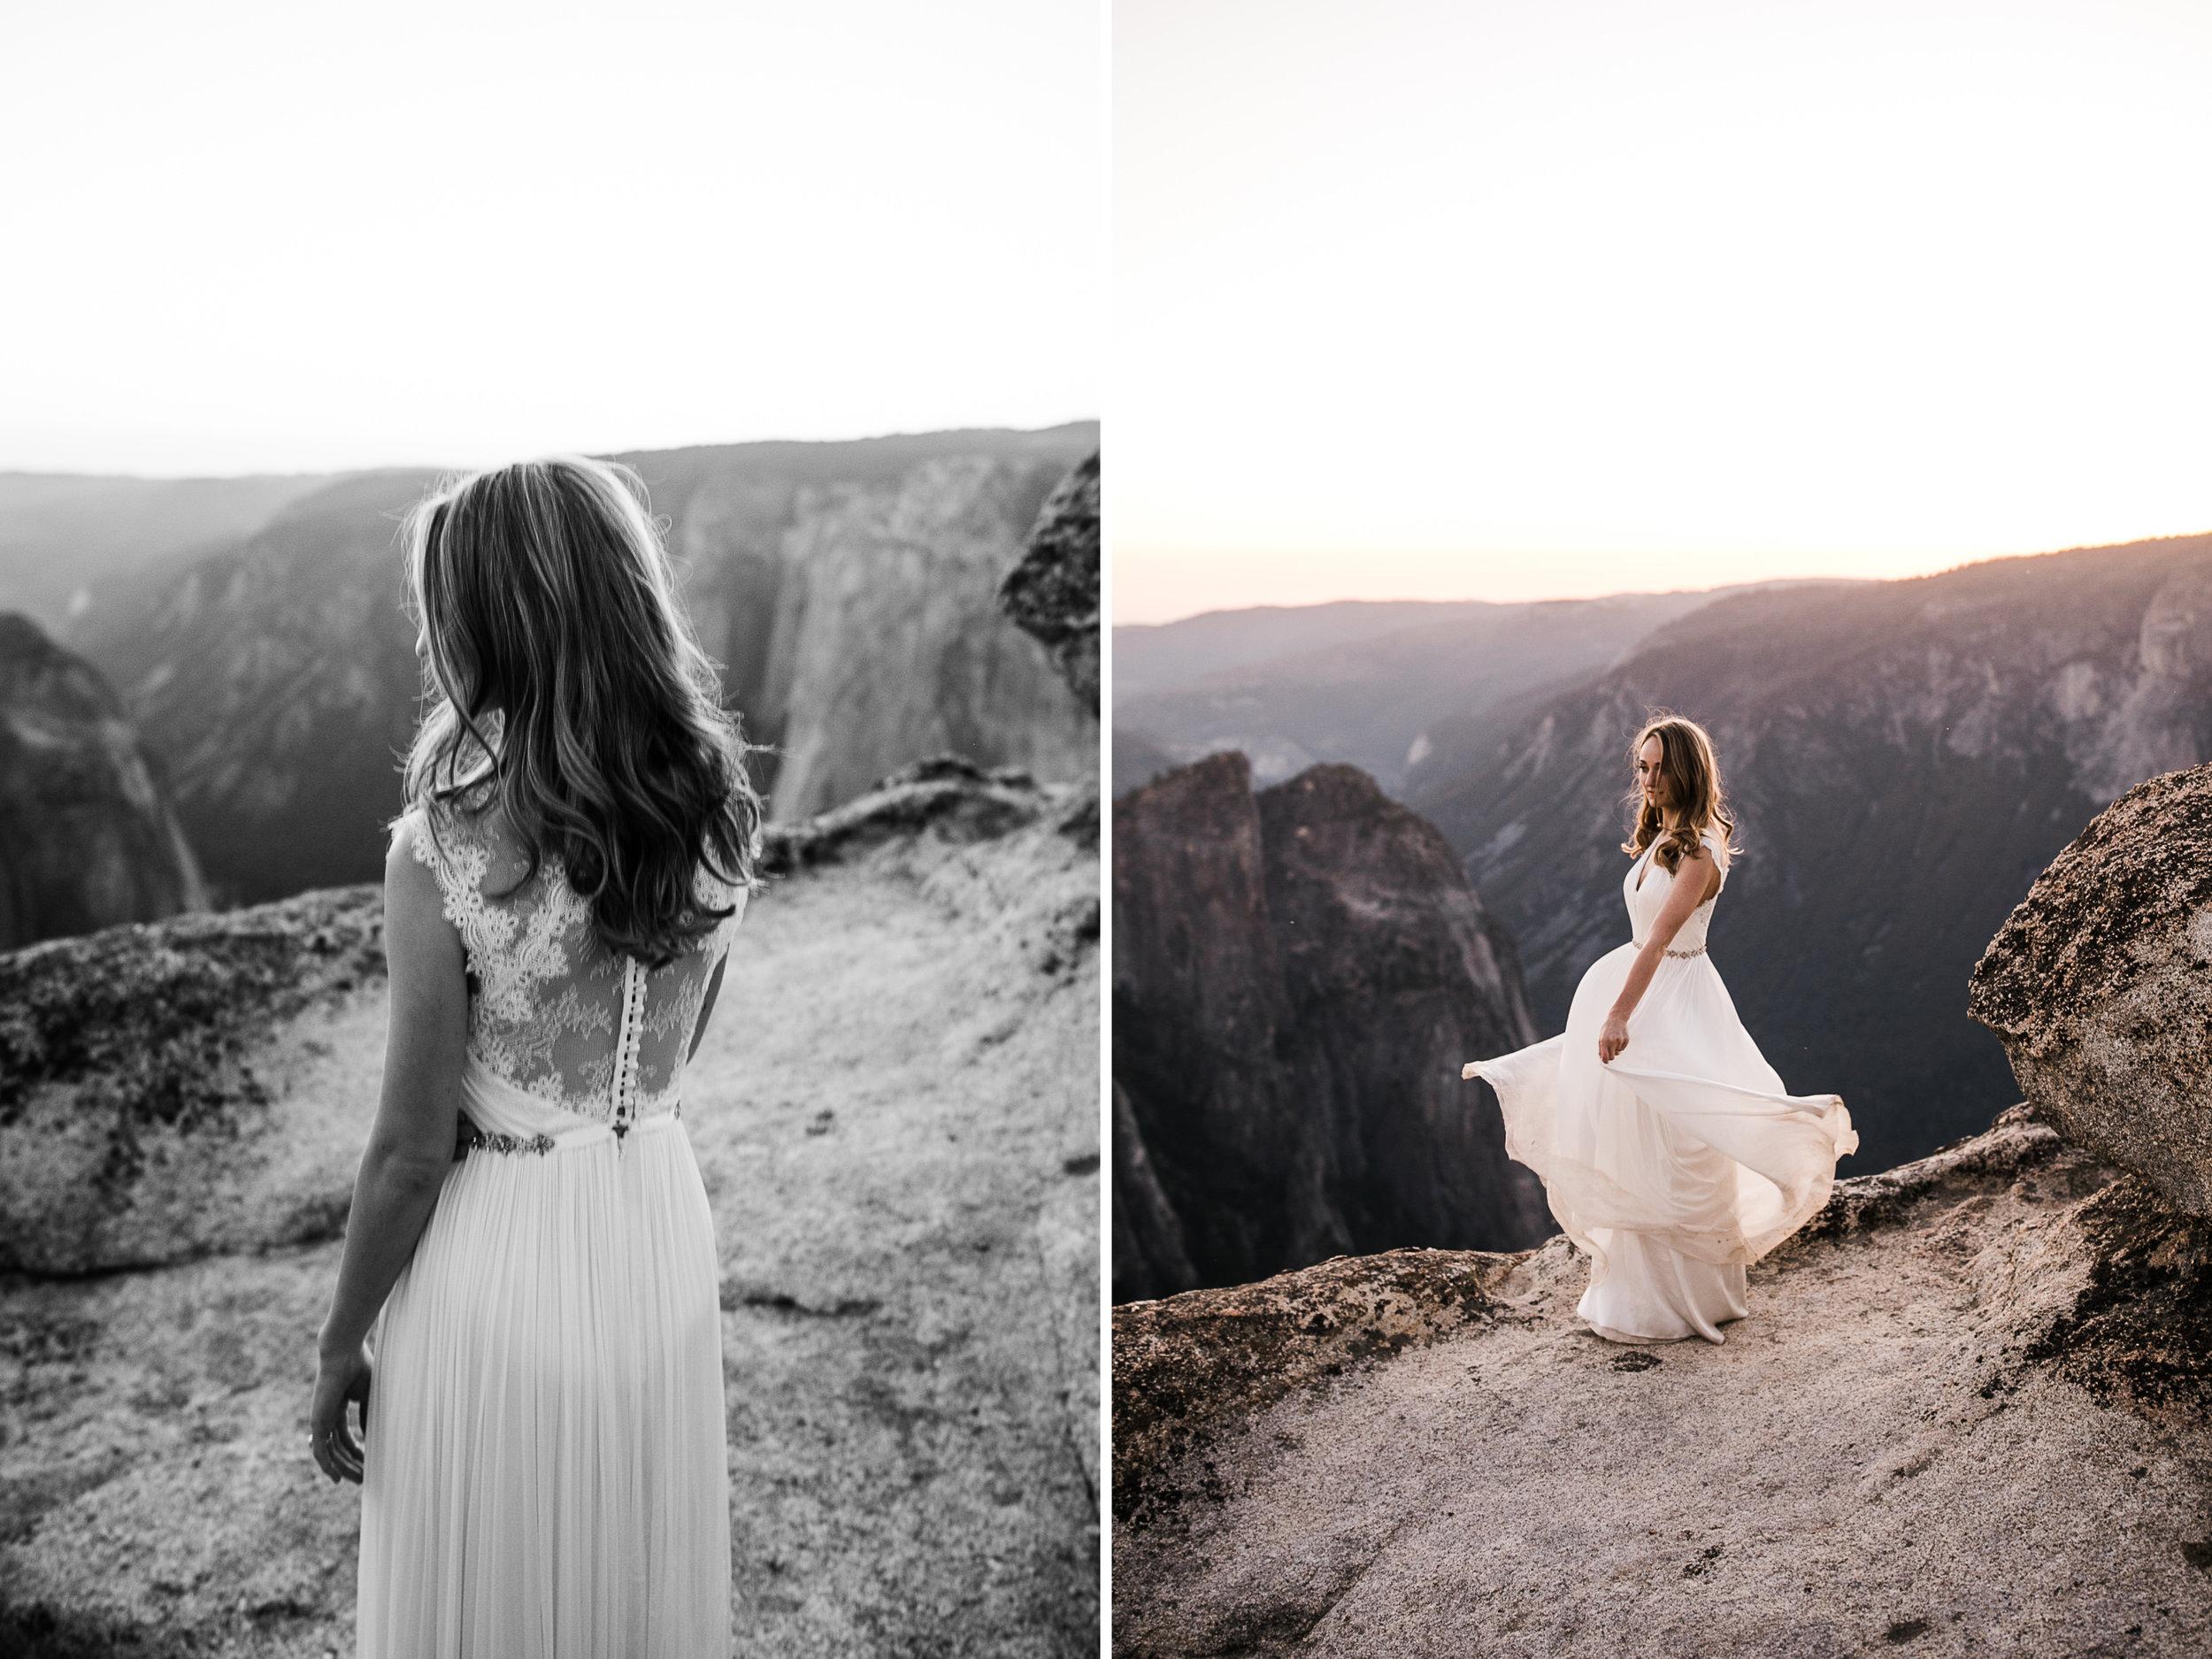 Chas + Michelle's adventurous wedding portraits | post-elopement photos in yosemite national park |adventure wedding photographer